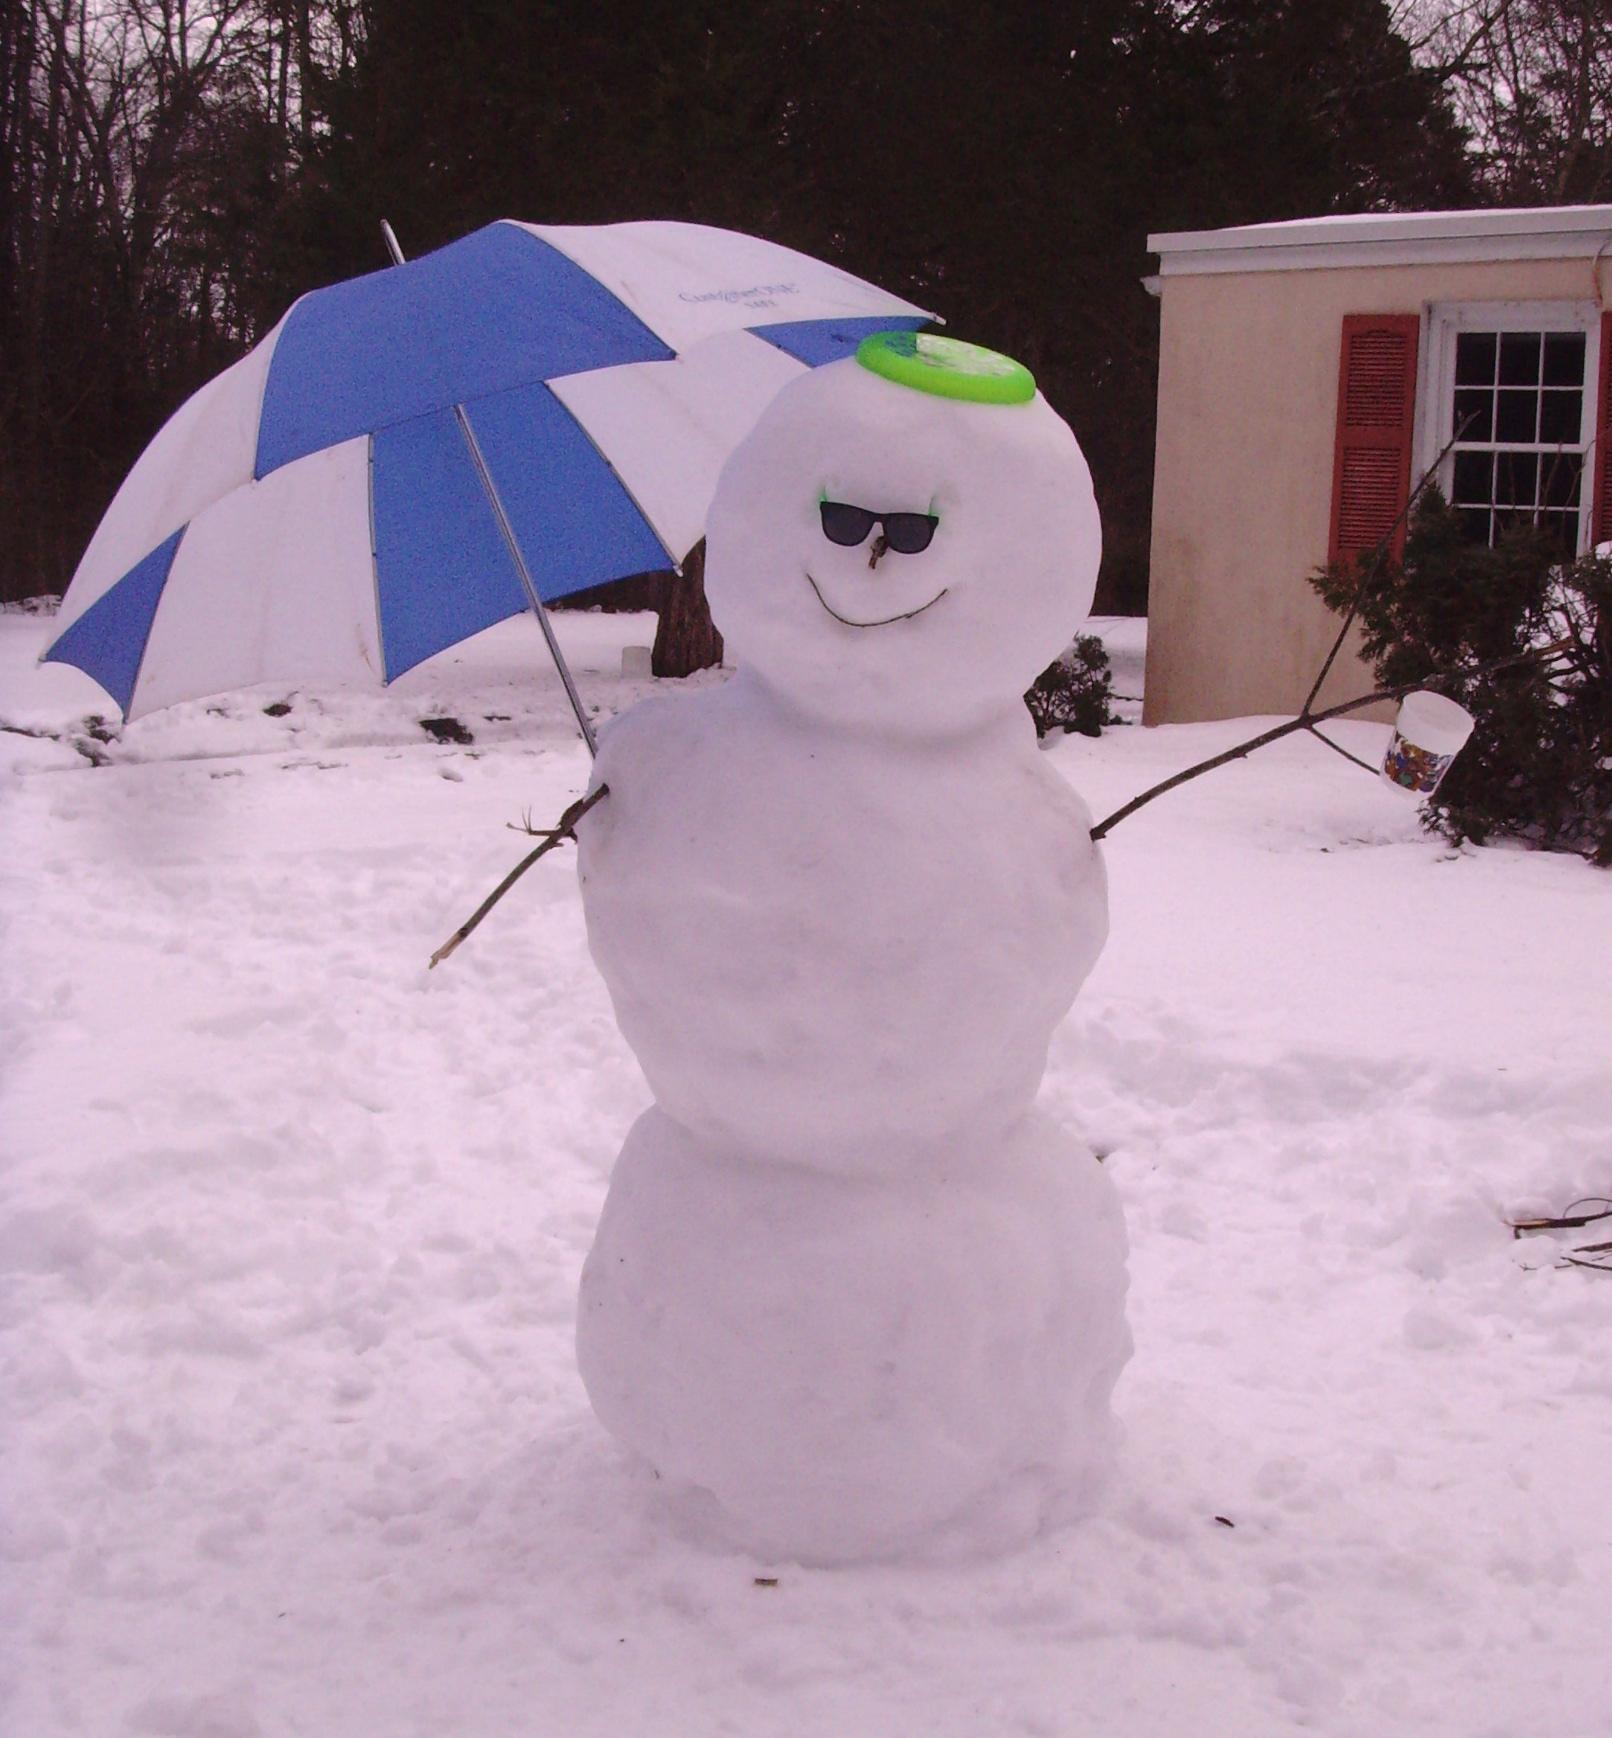 My snowman creation.